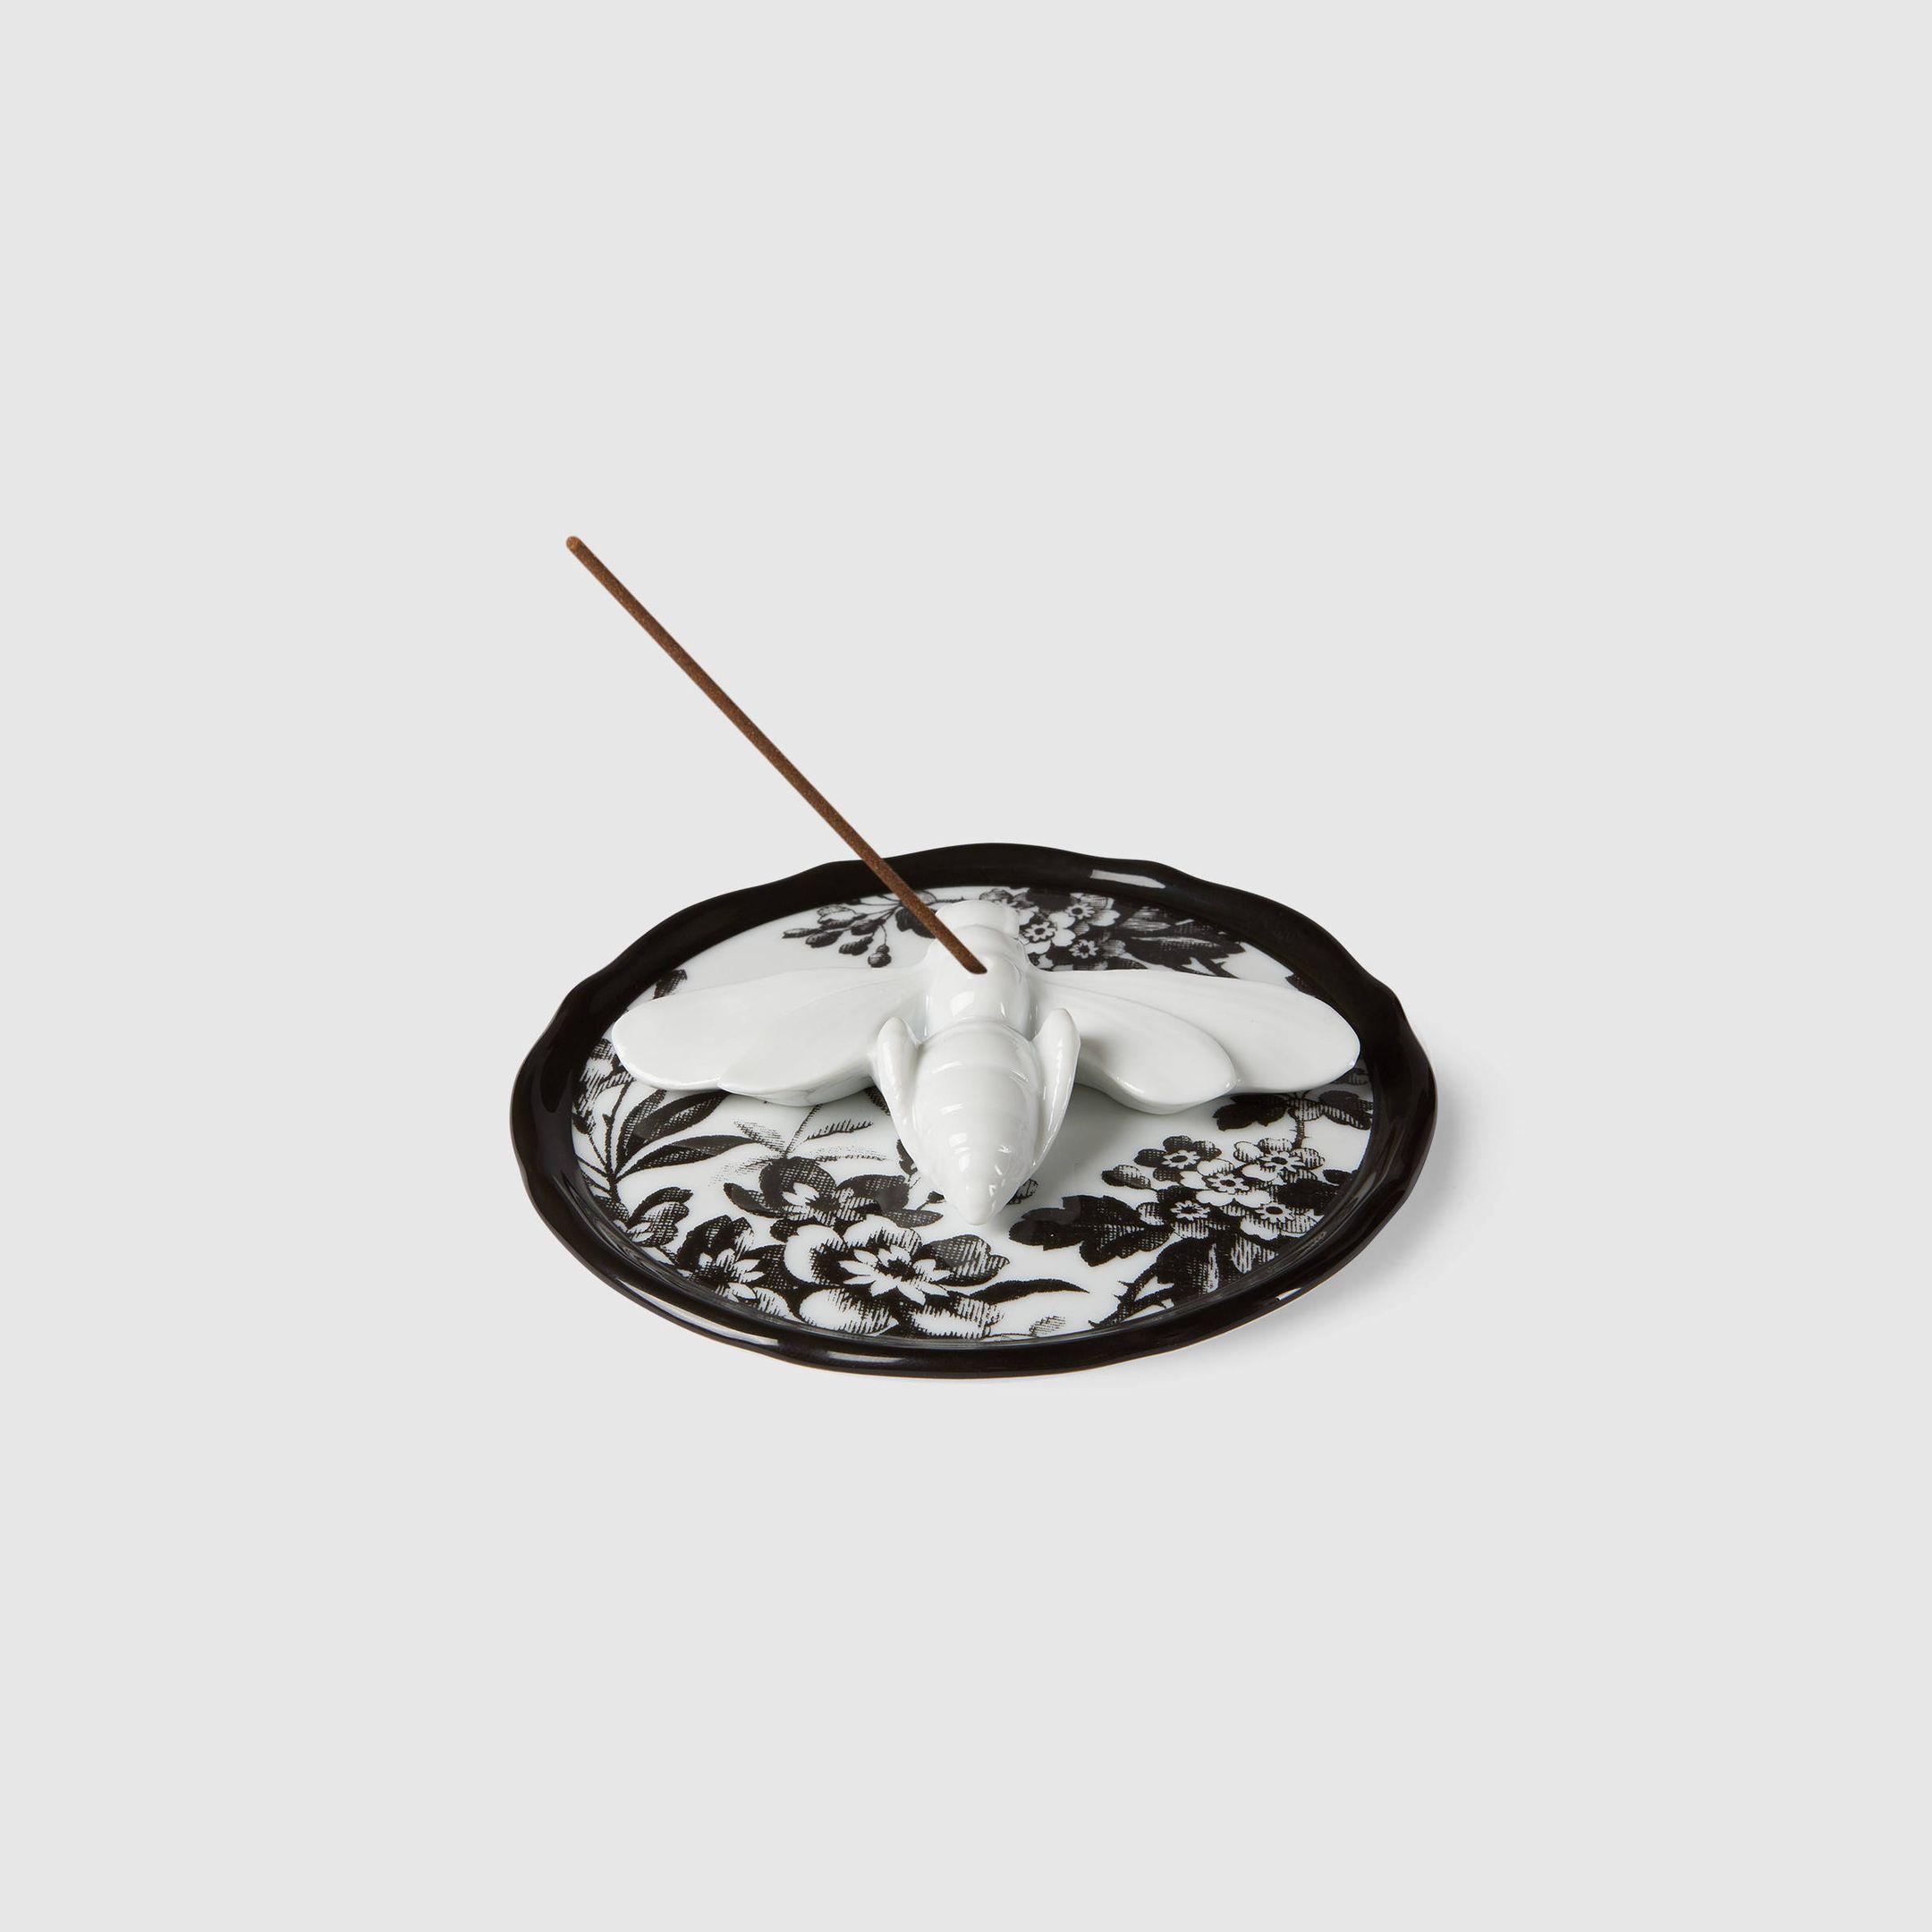 Herbarium bee incense burner, $295